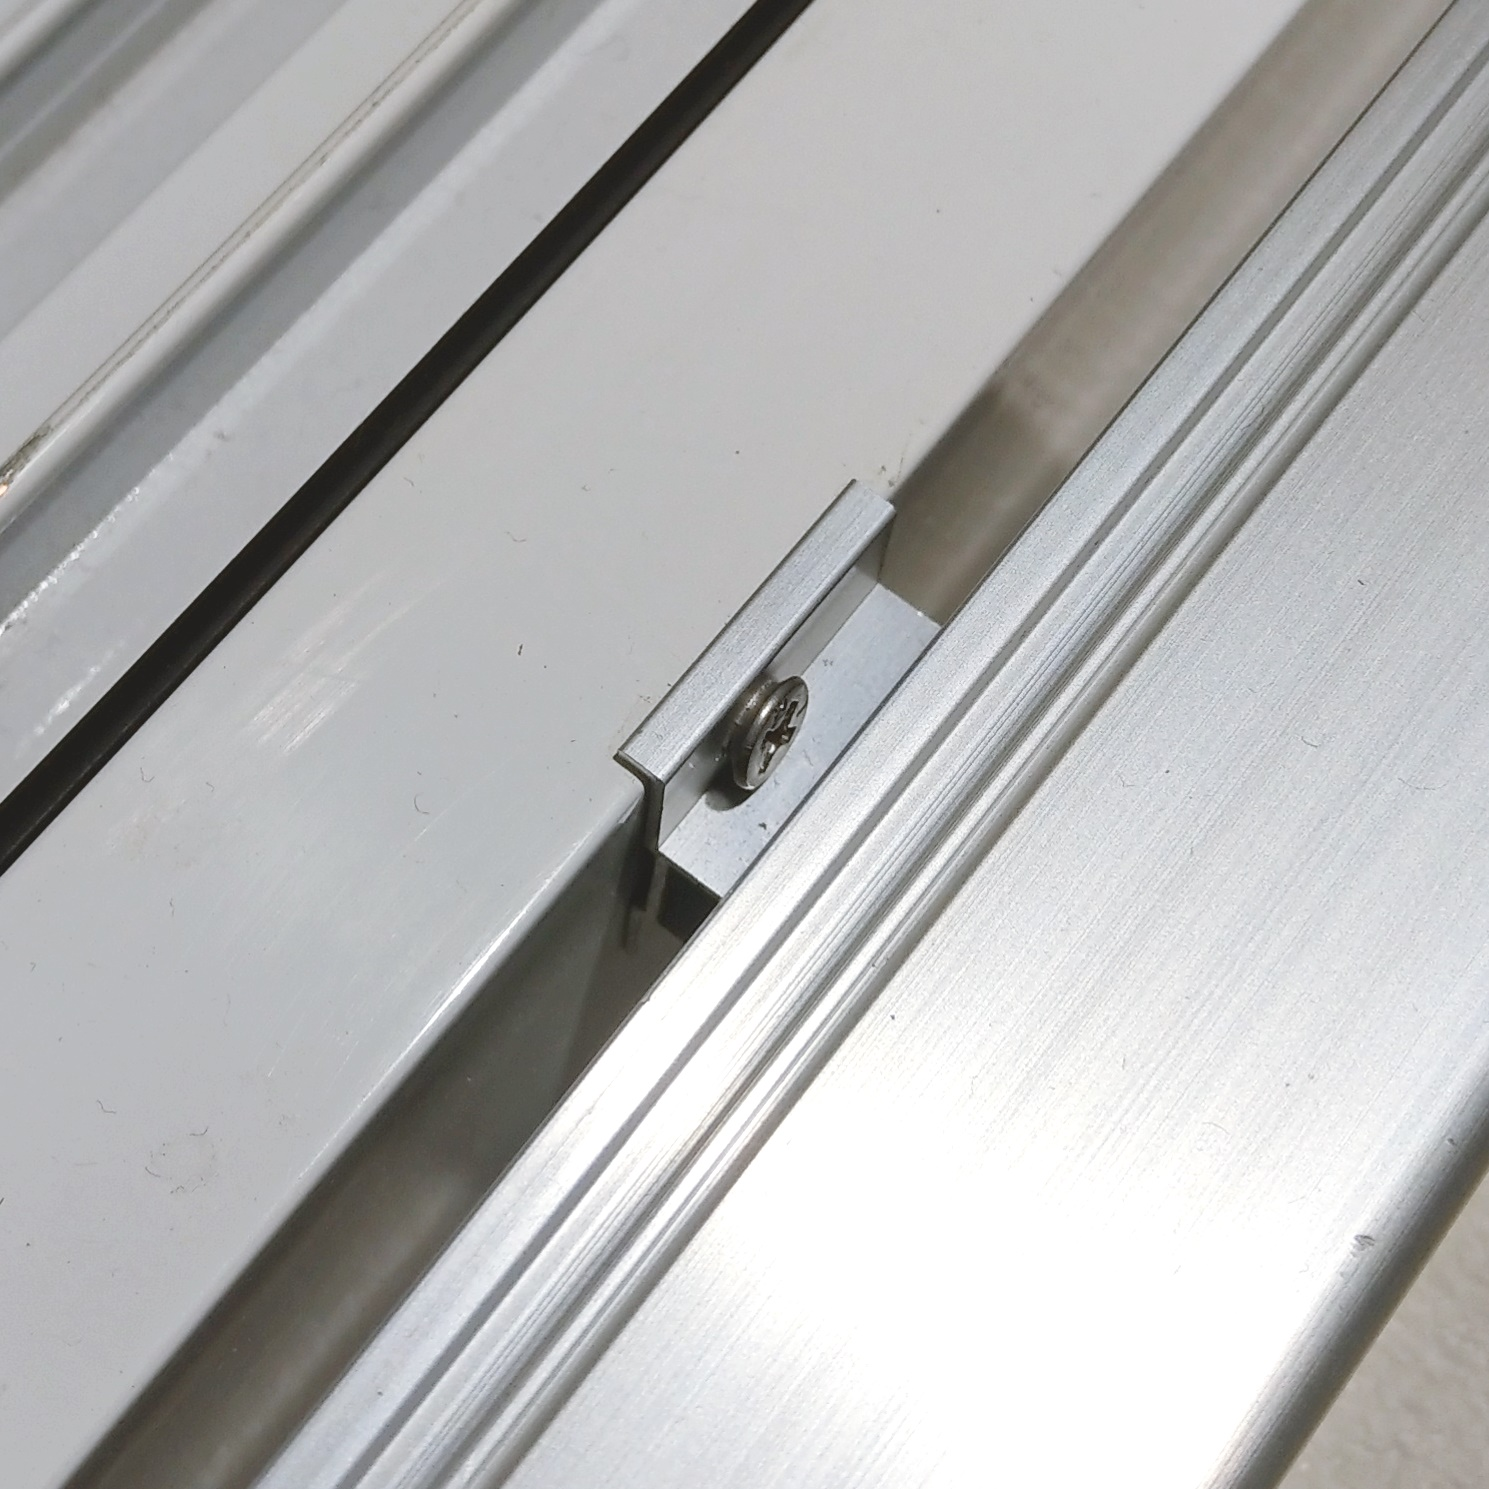 KST-SL02 track linear actuator -  (8)